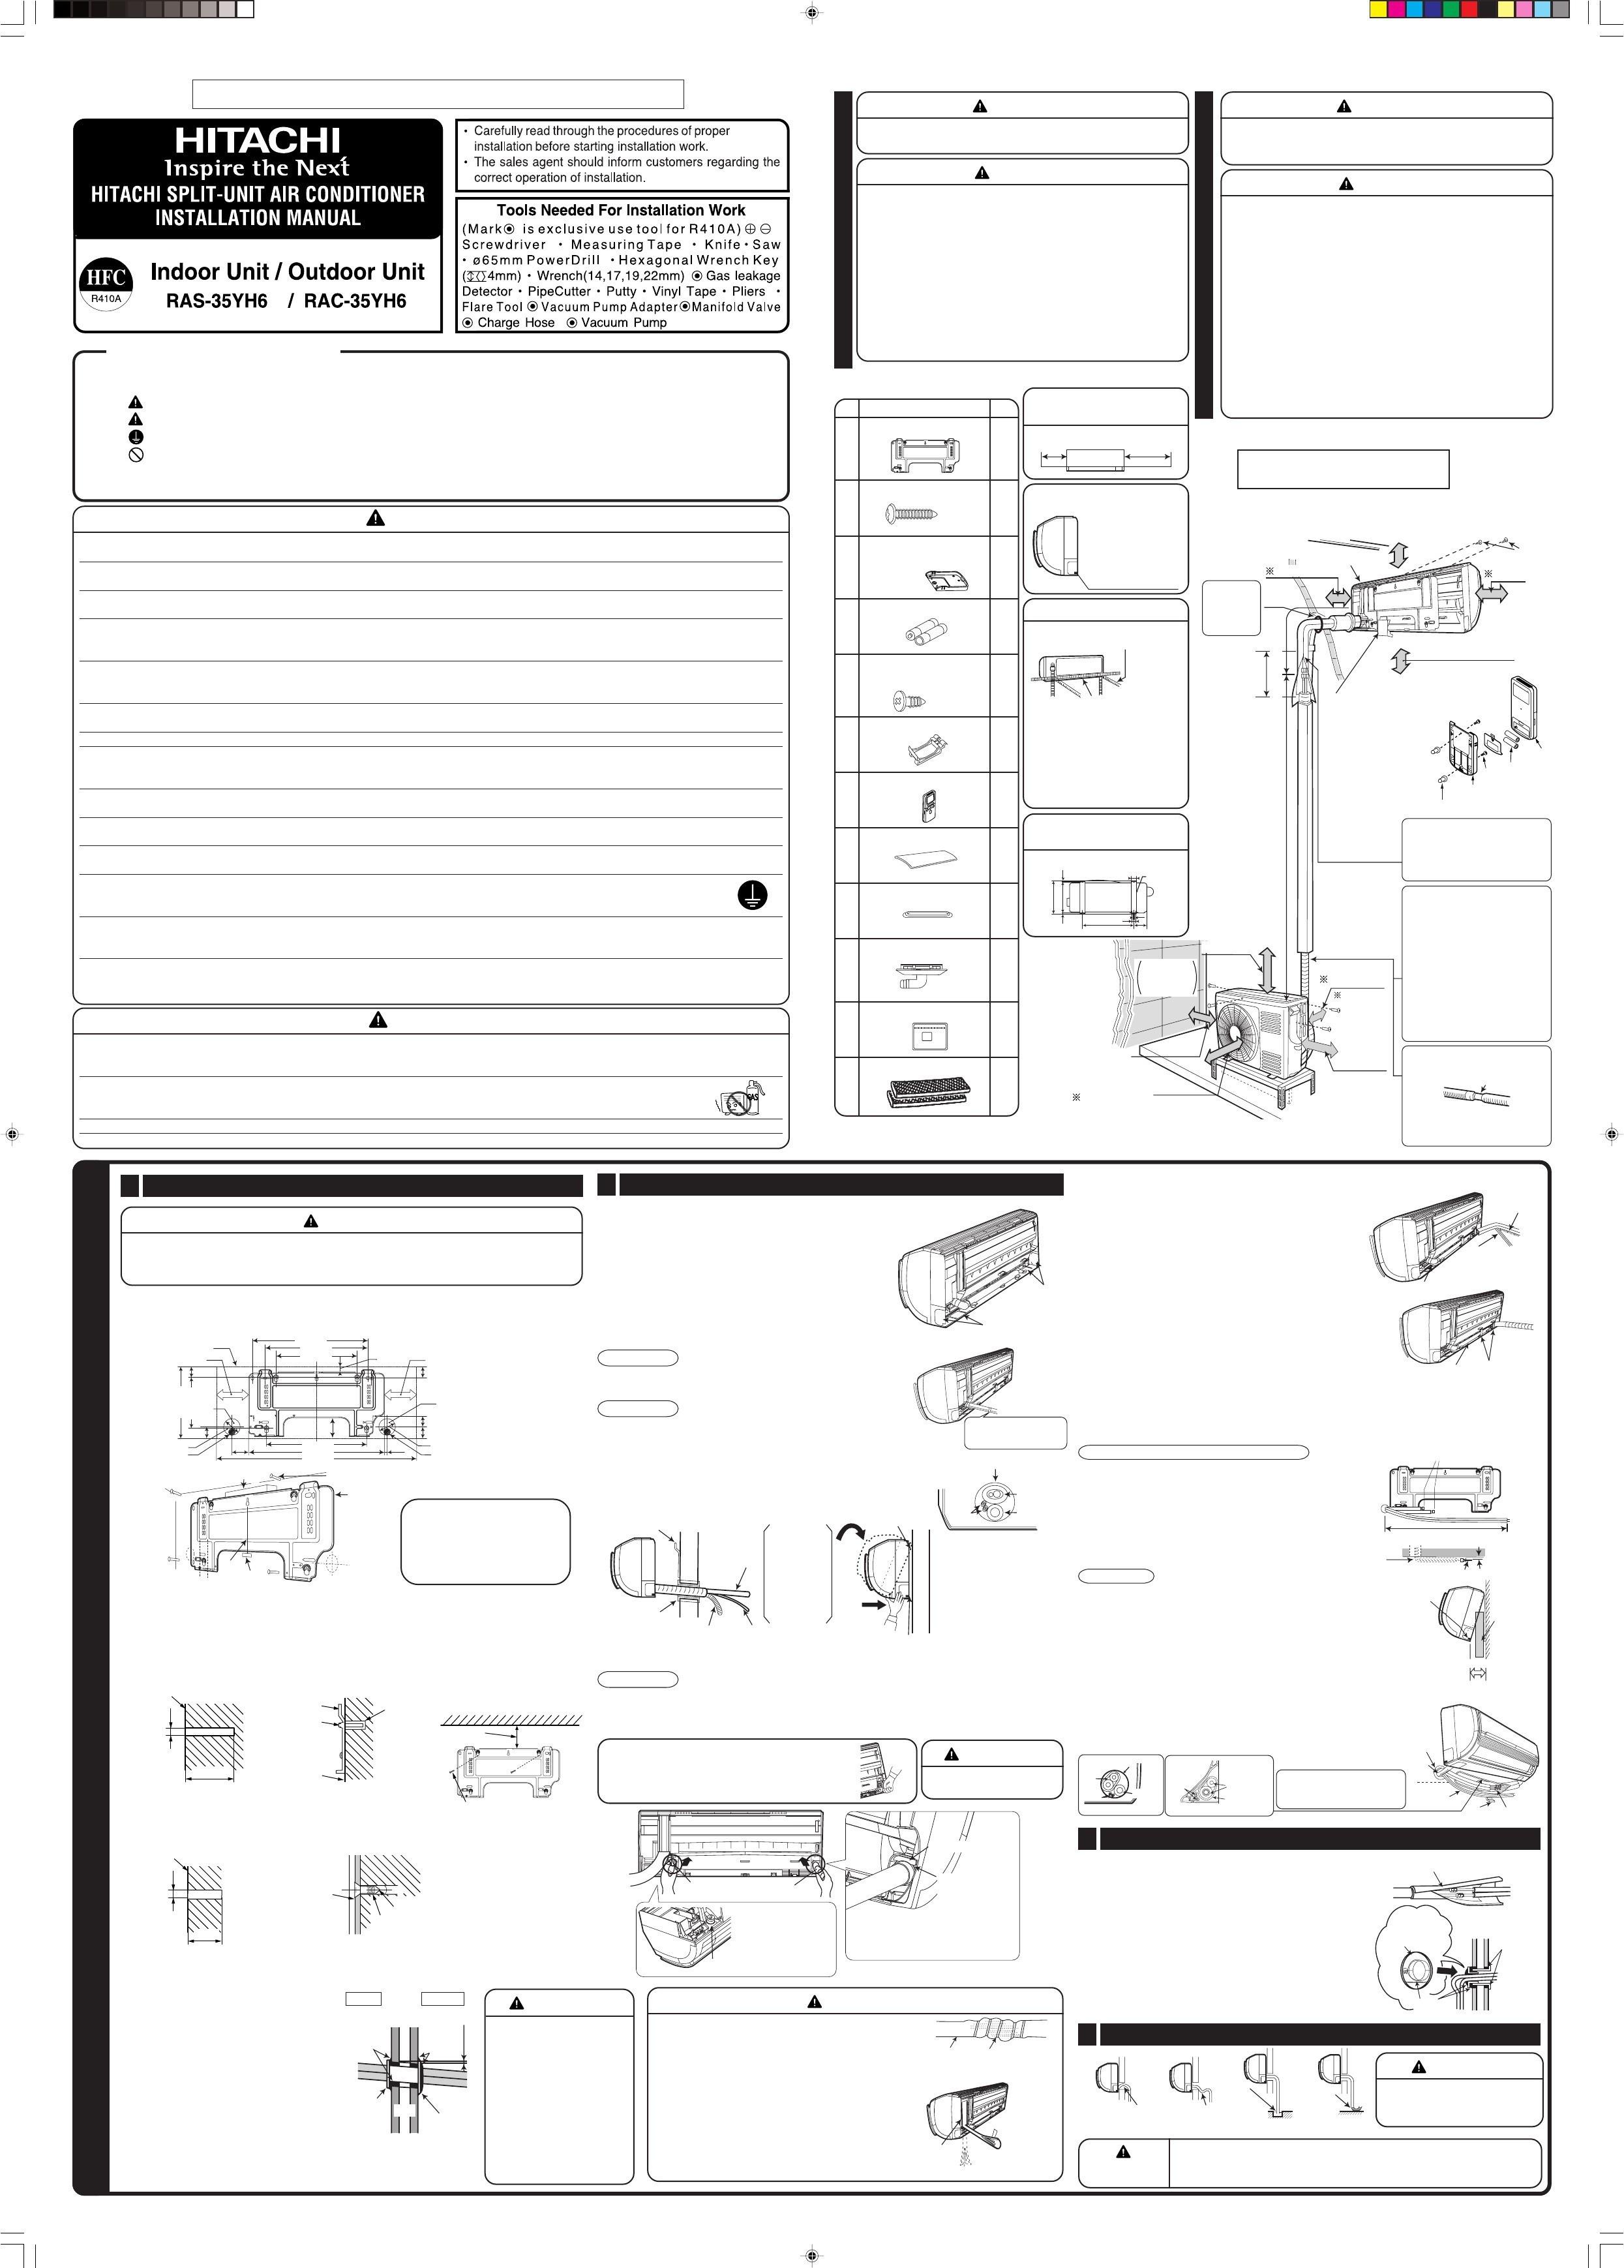 sony cdx gt410u wiring diagram krone rj11 socket gt71w free